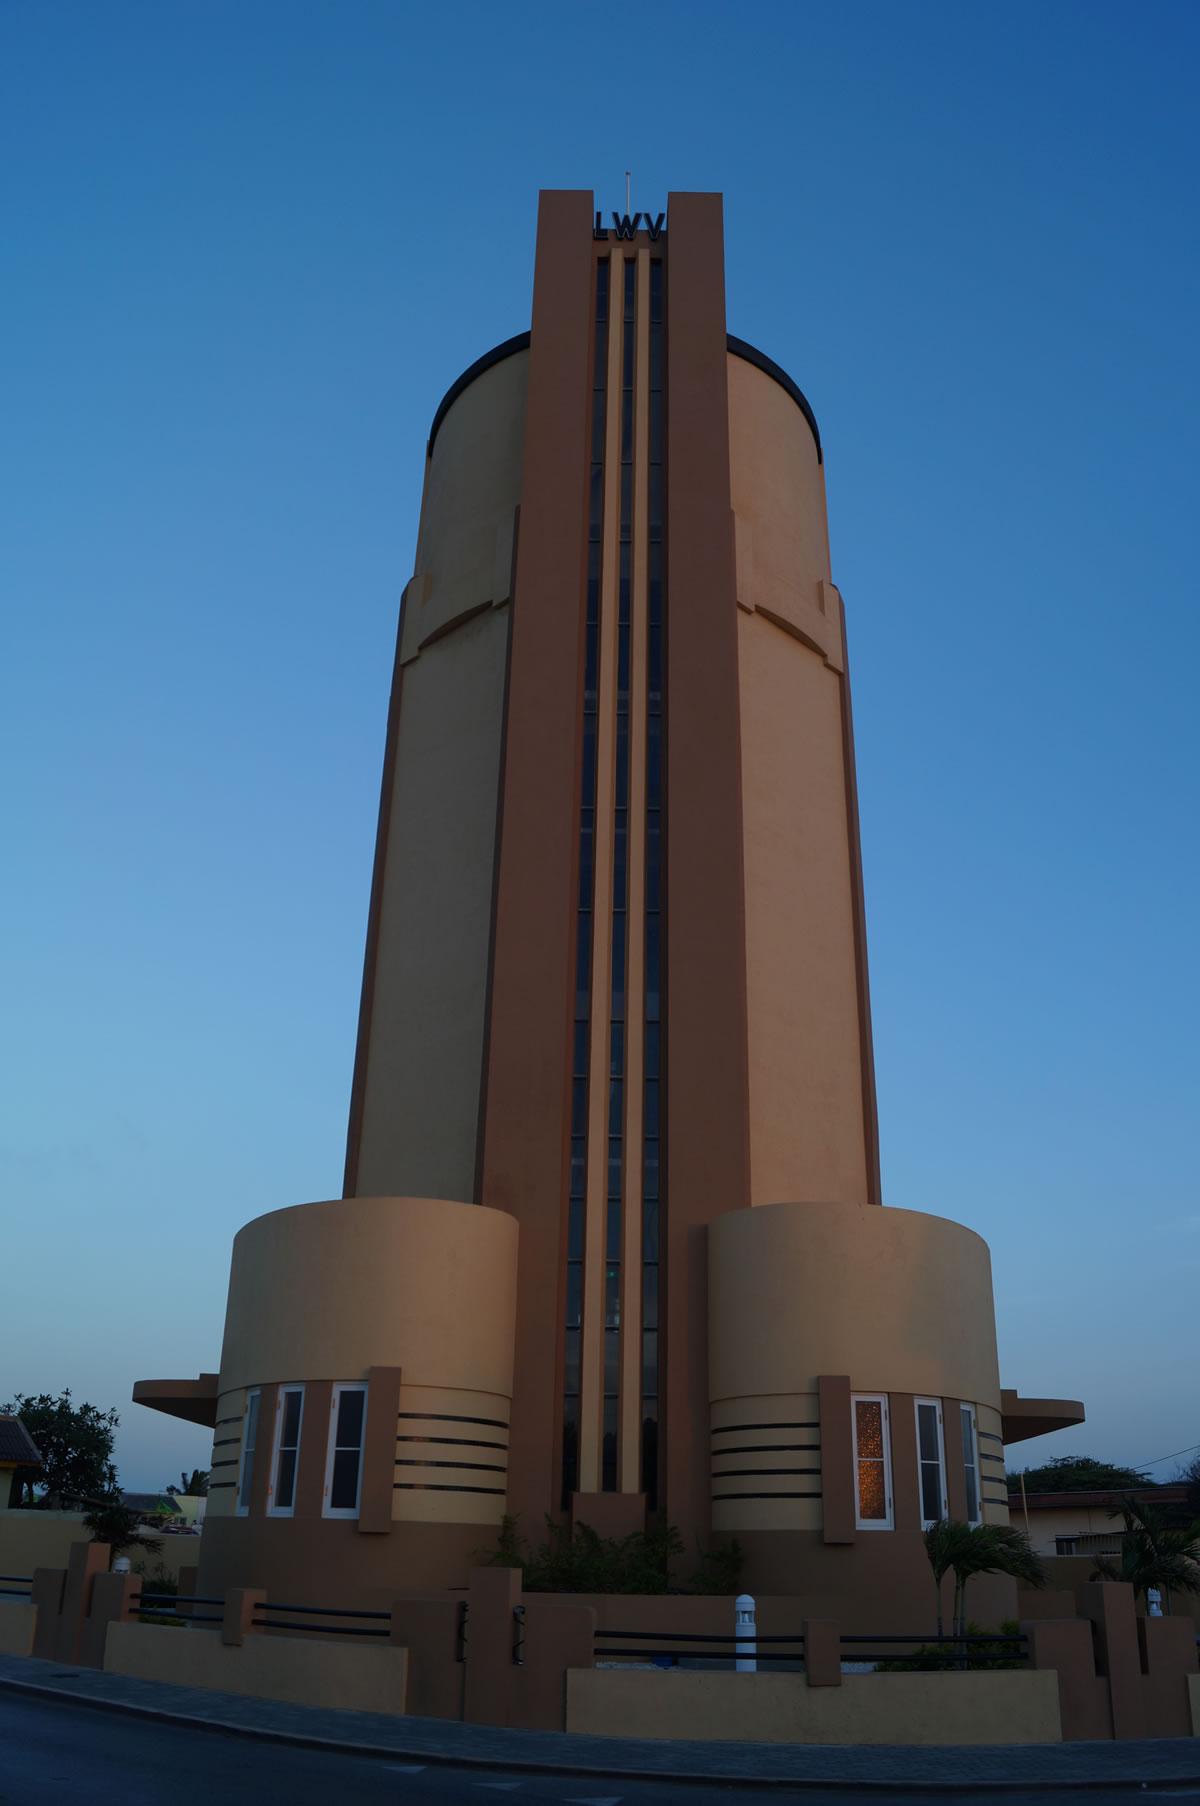 Water Tower San Nicolas standing tall